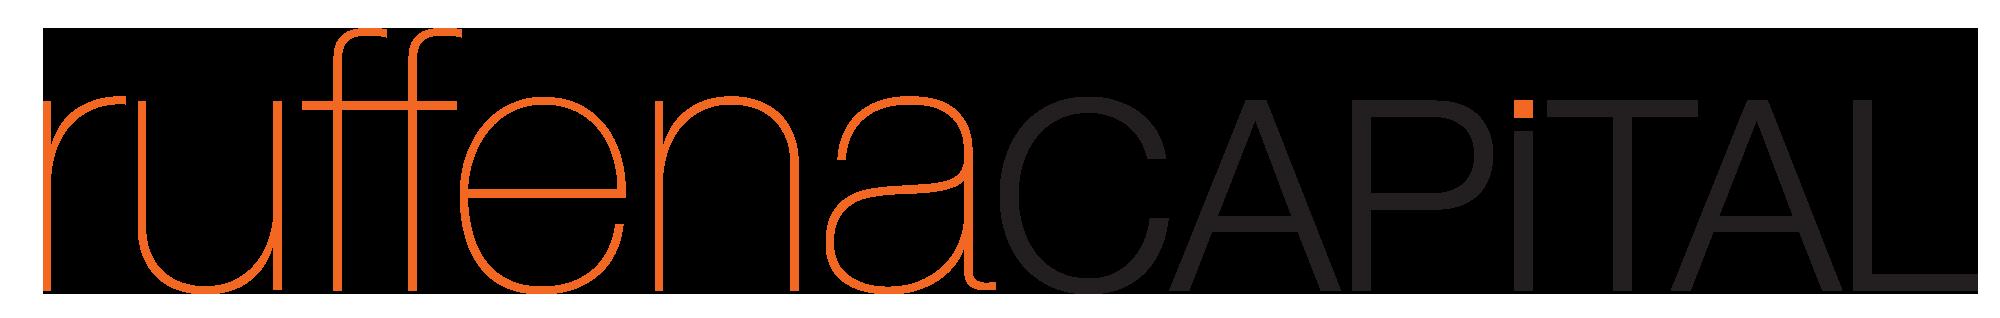 Ruffena logo